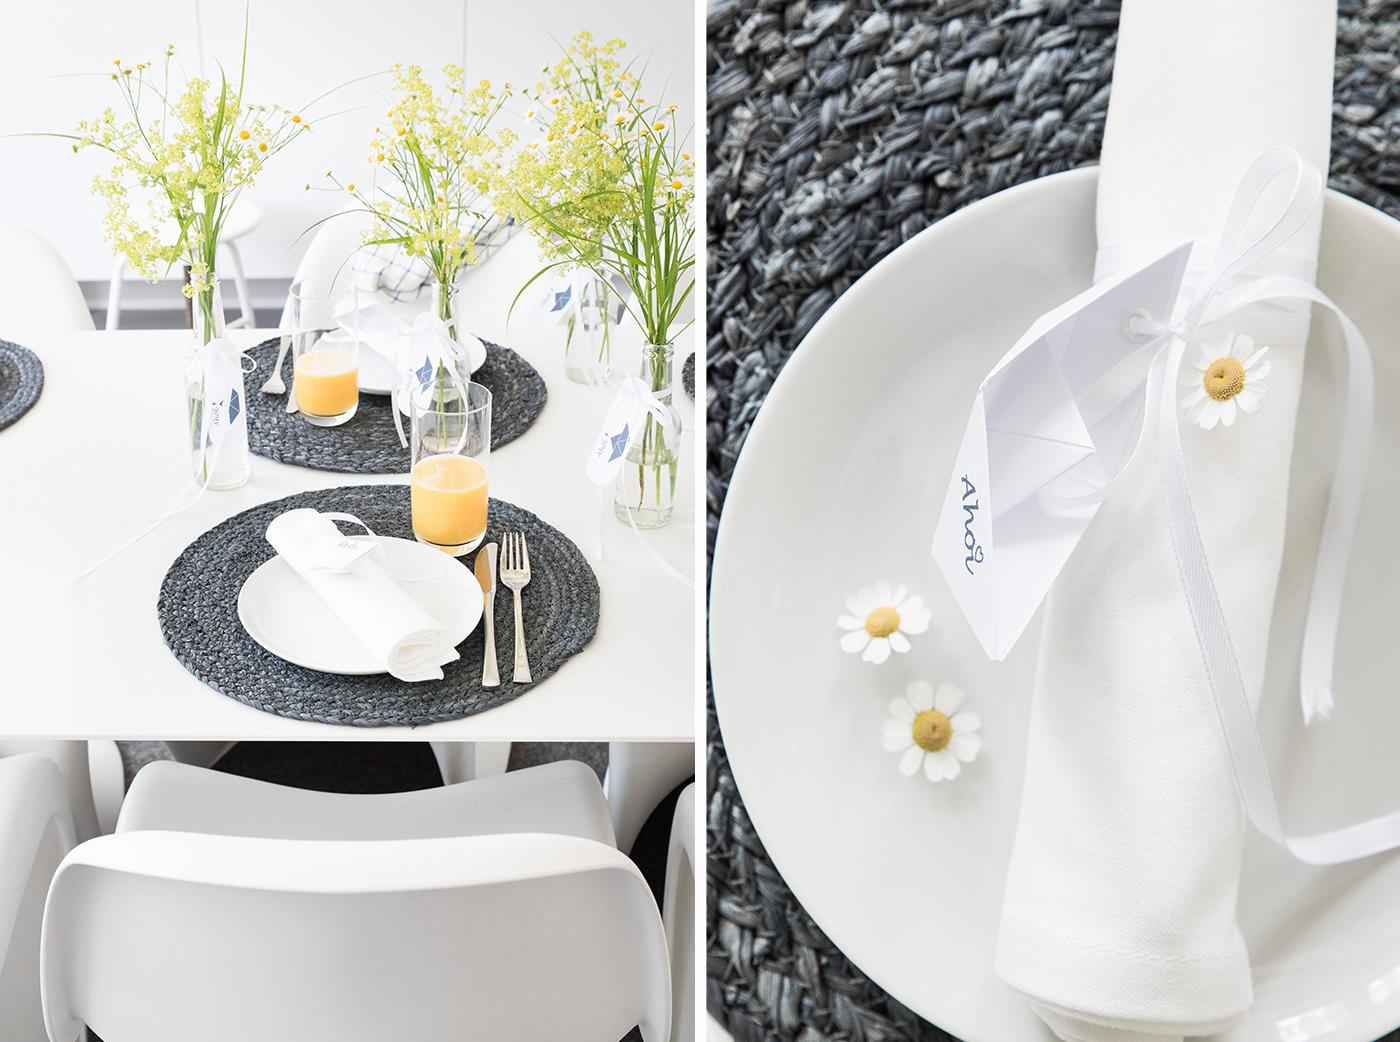 maritime tischdekoration sch n bei dir by depot. Black Bedroom Furniture Sets. Home Design Ideas